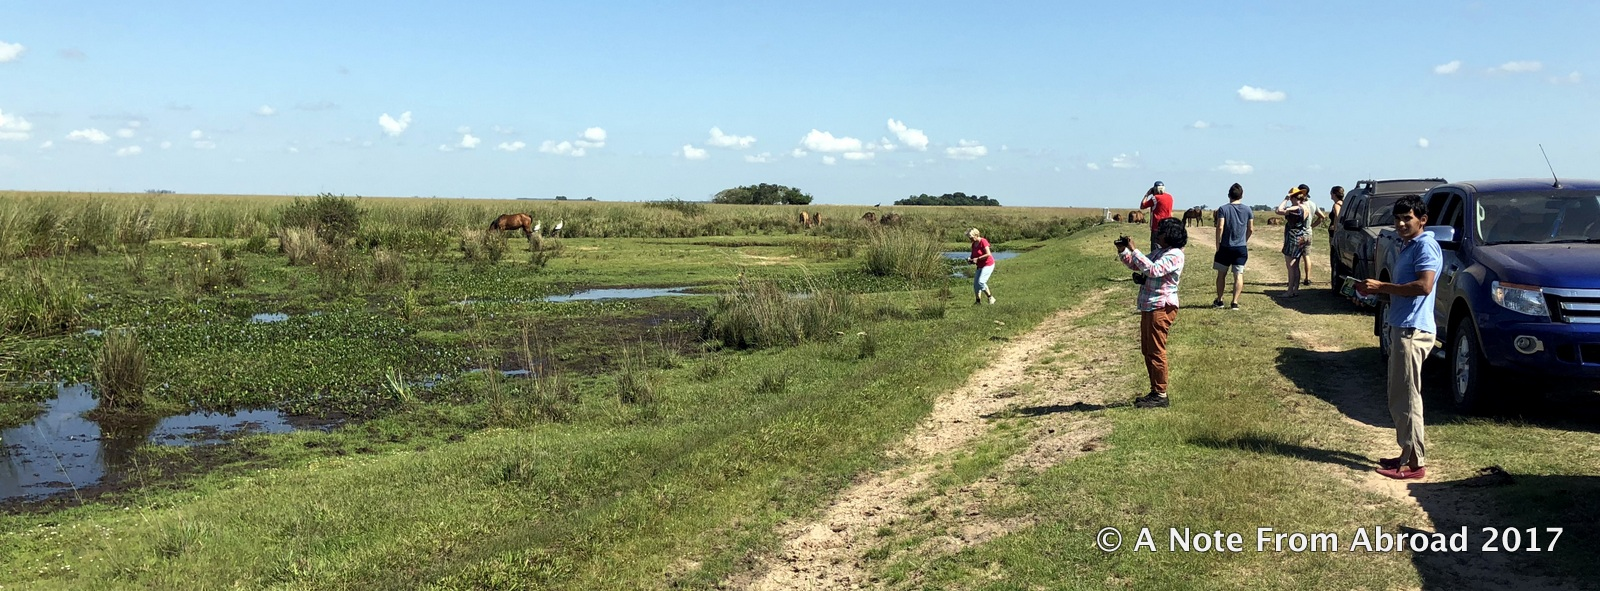 The Ibera Wetlands of Argentina